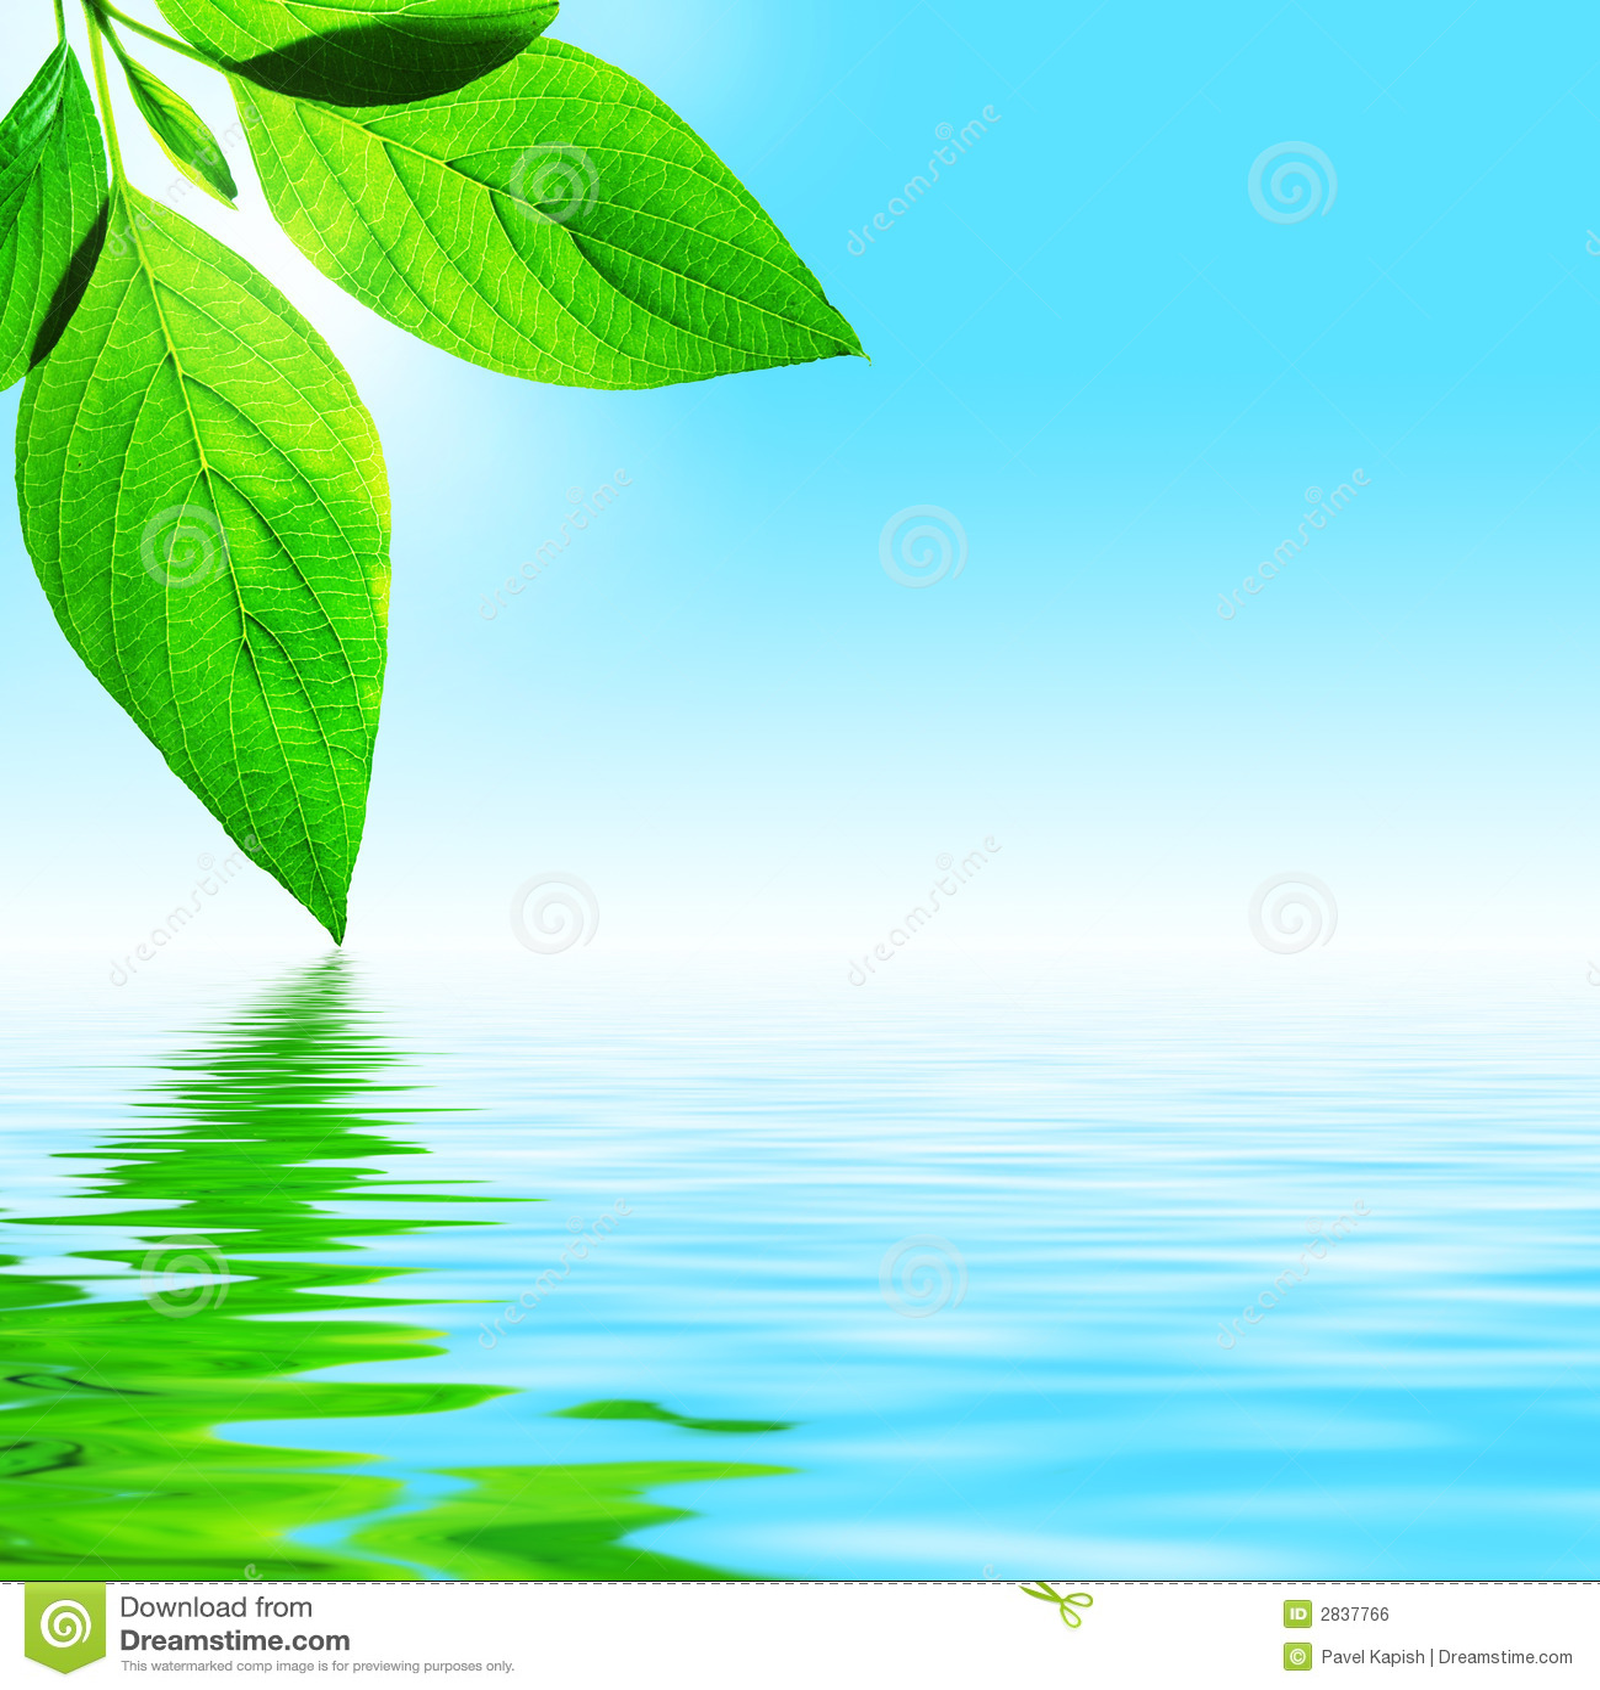 sunshine wallpaper free download